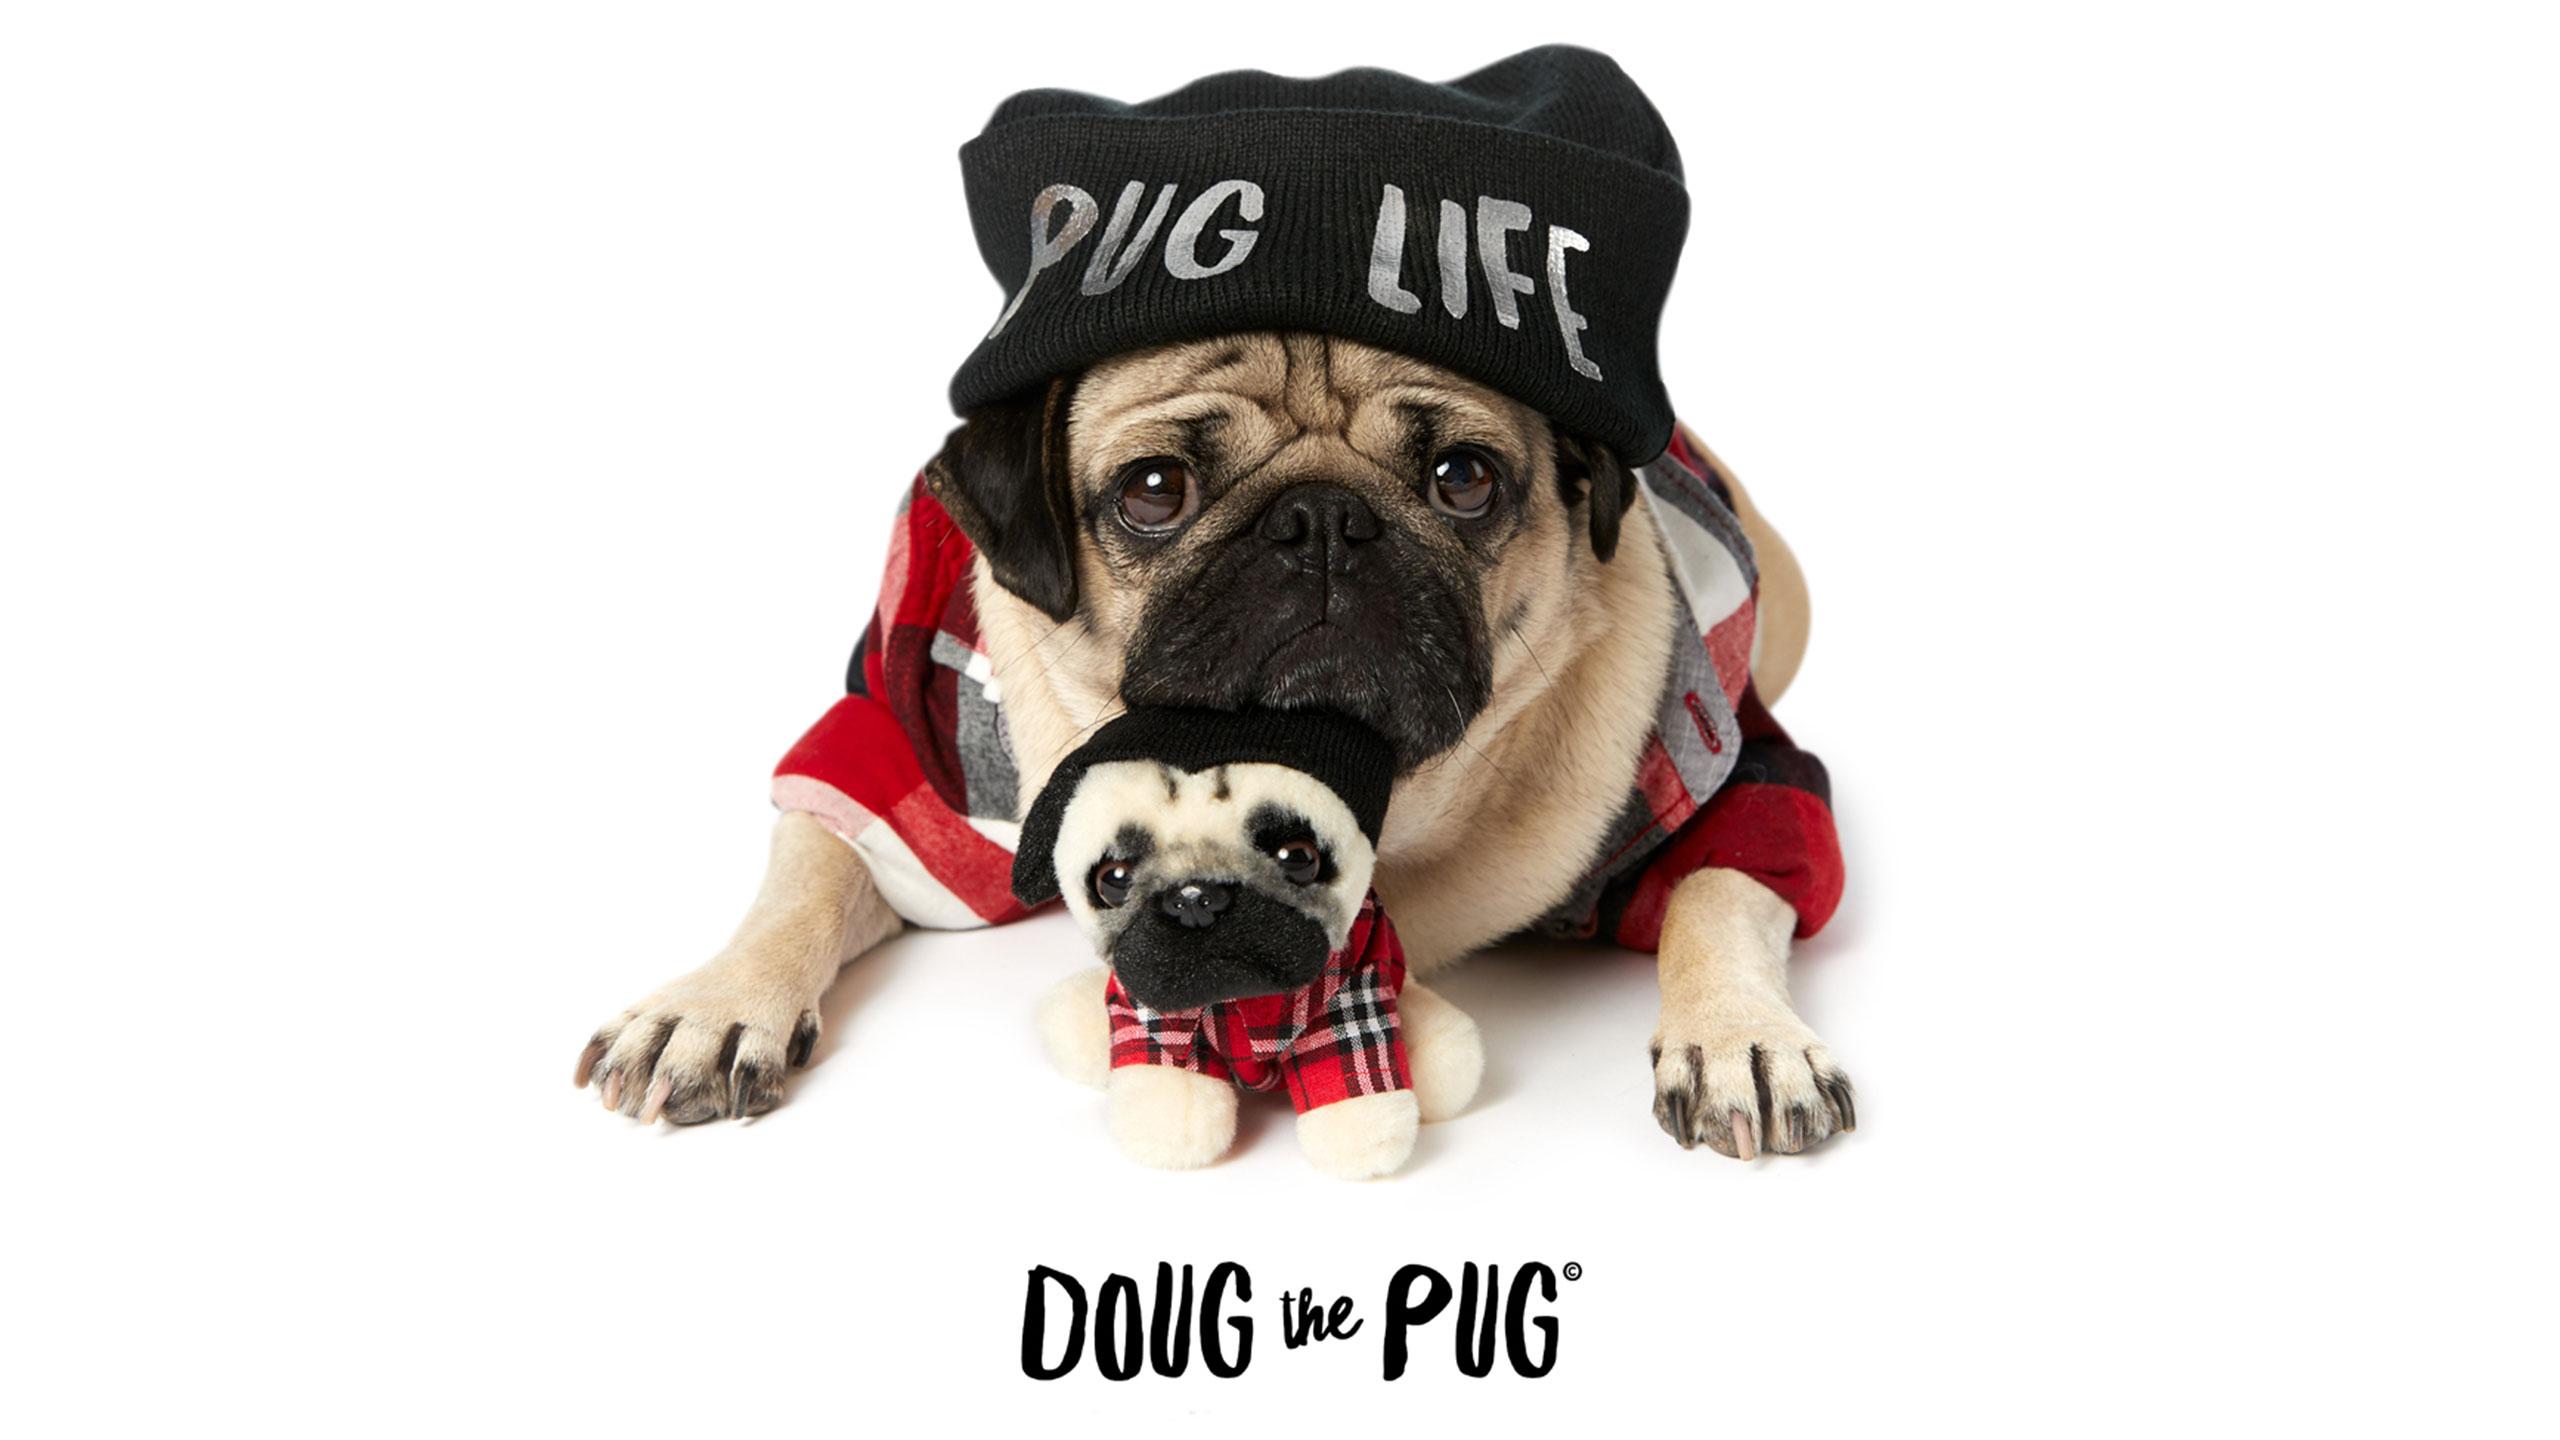 aa20e0dccfb Doug The Pug™